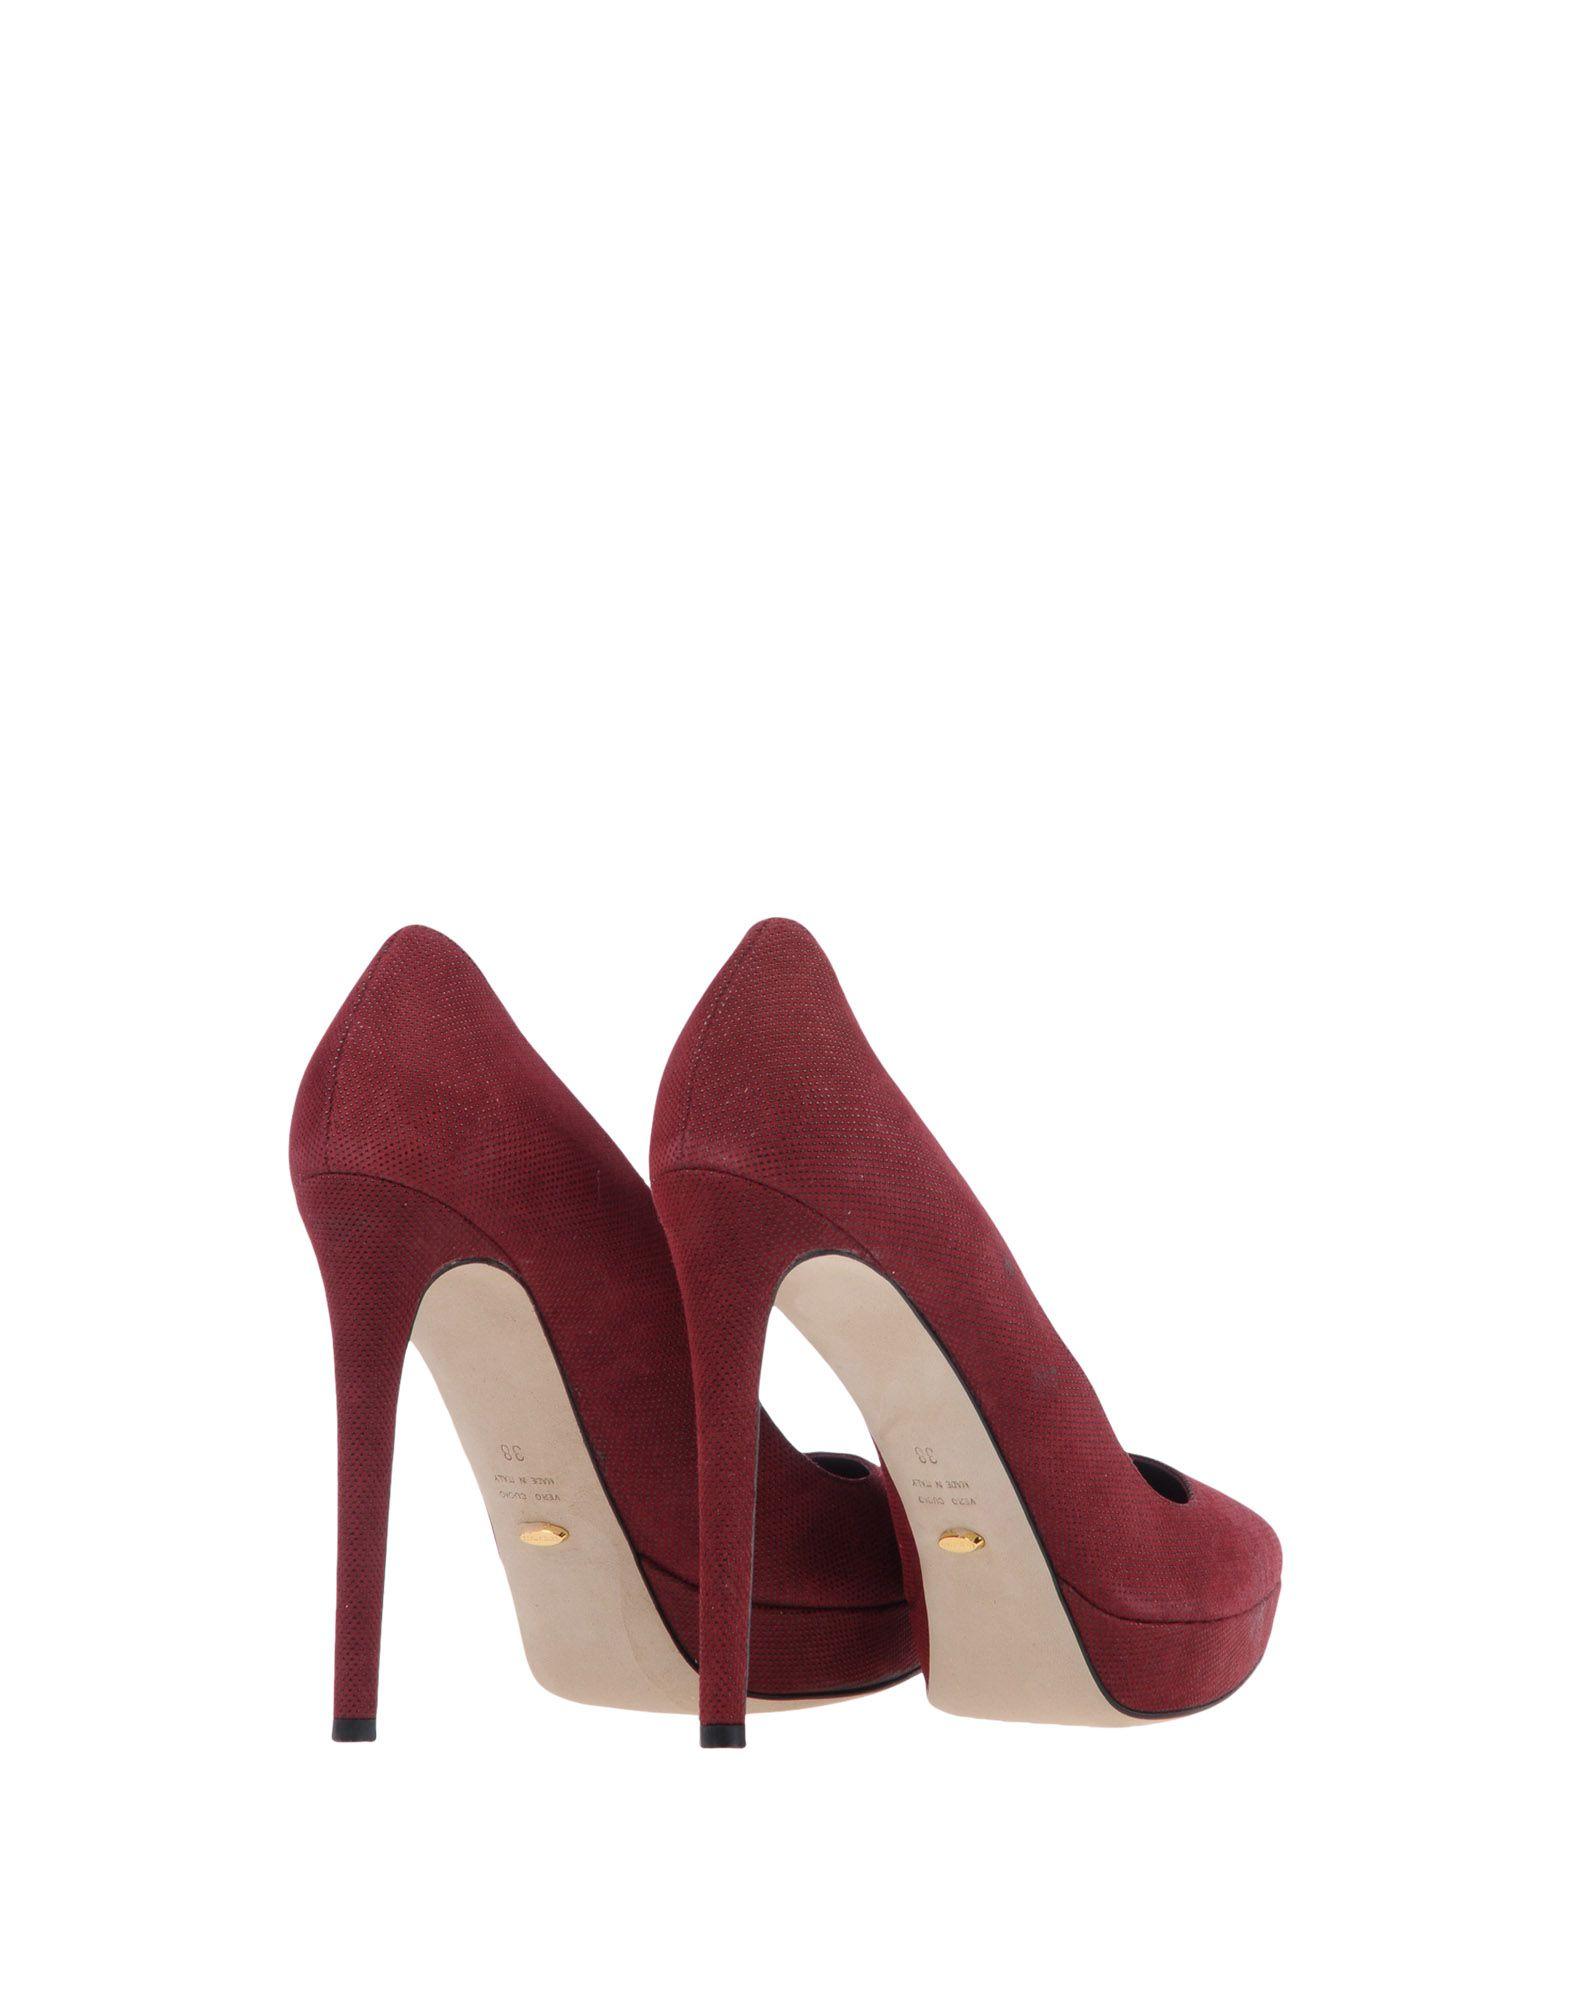 Stilvolle billige Schuhe Sergio Sergio Sergio Rossi Pumps Damen  11284648BU 3a4bc6